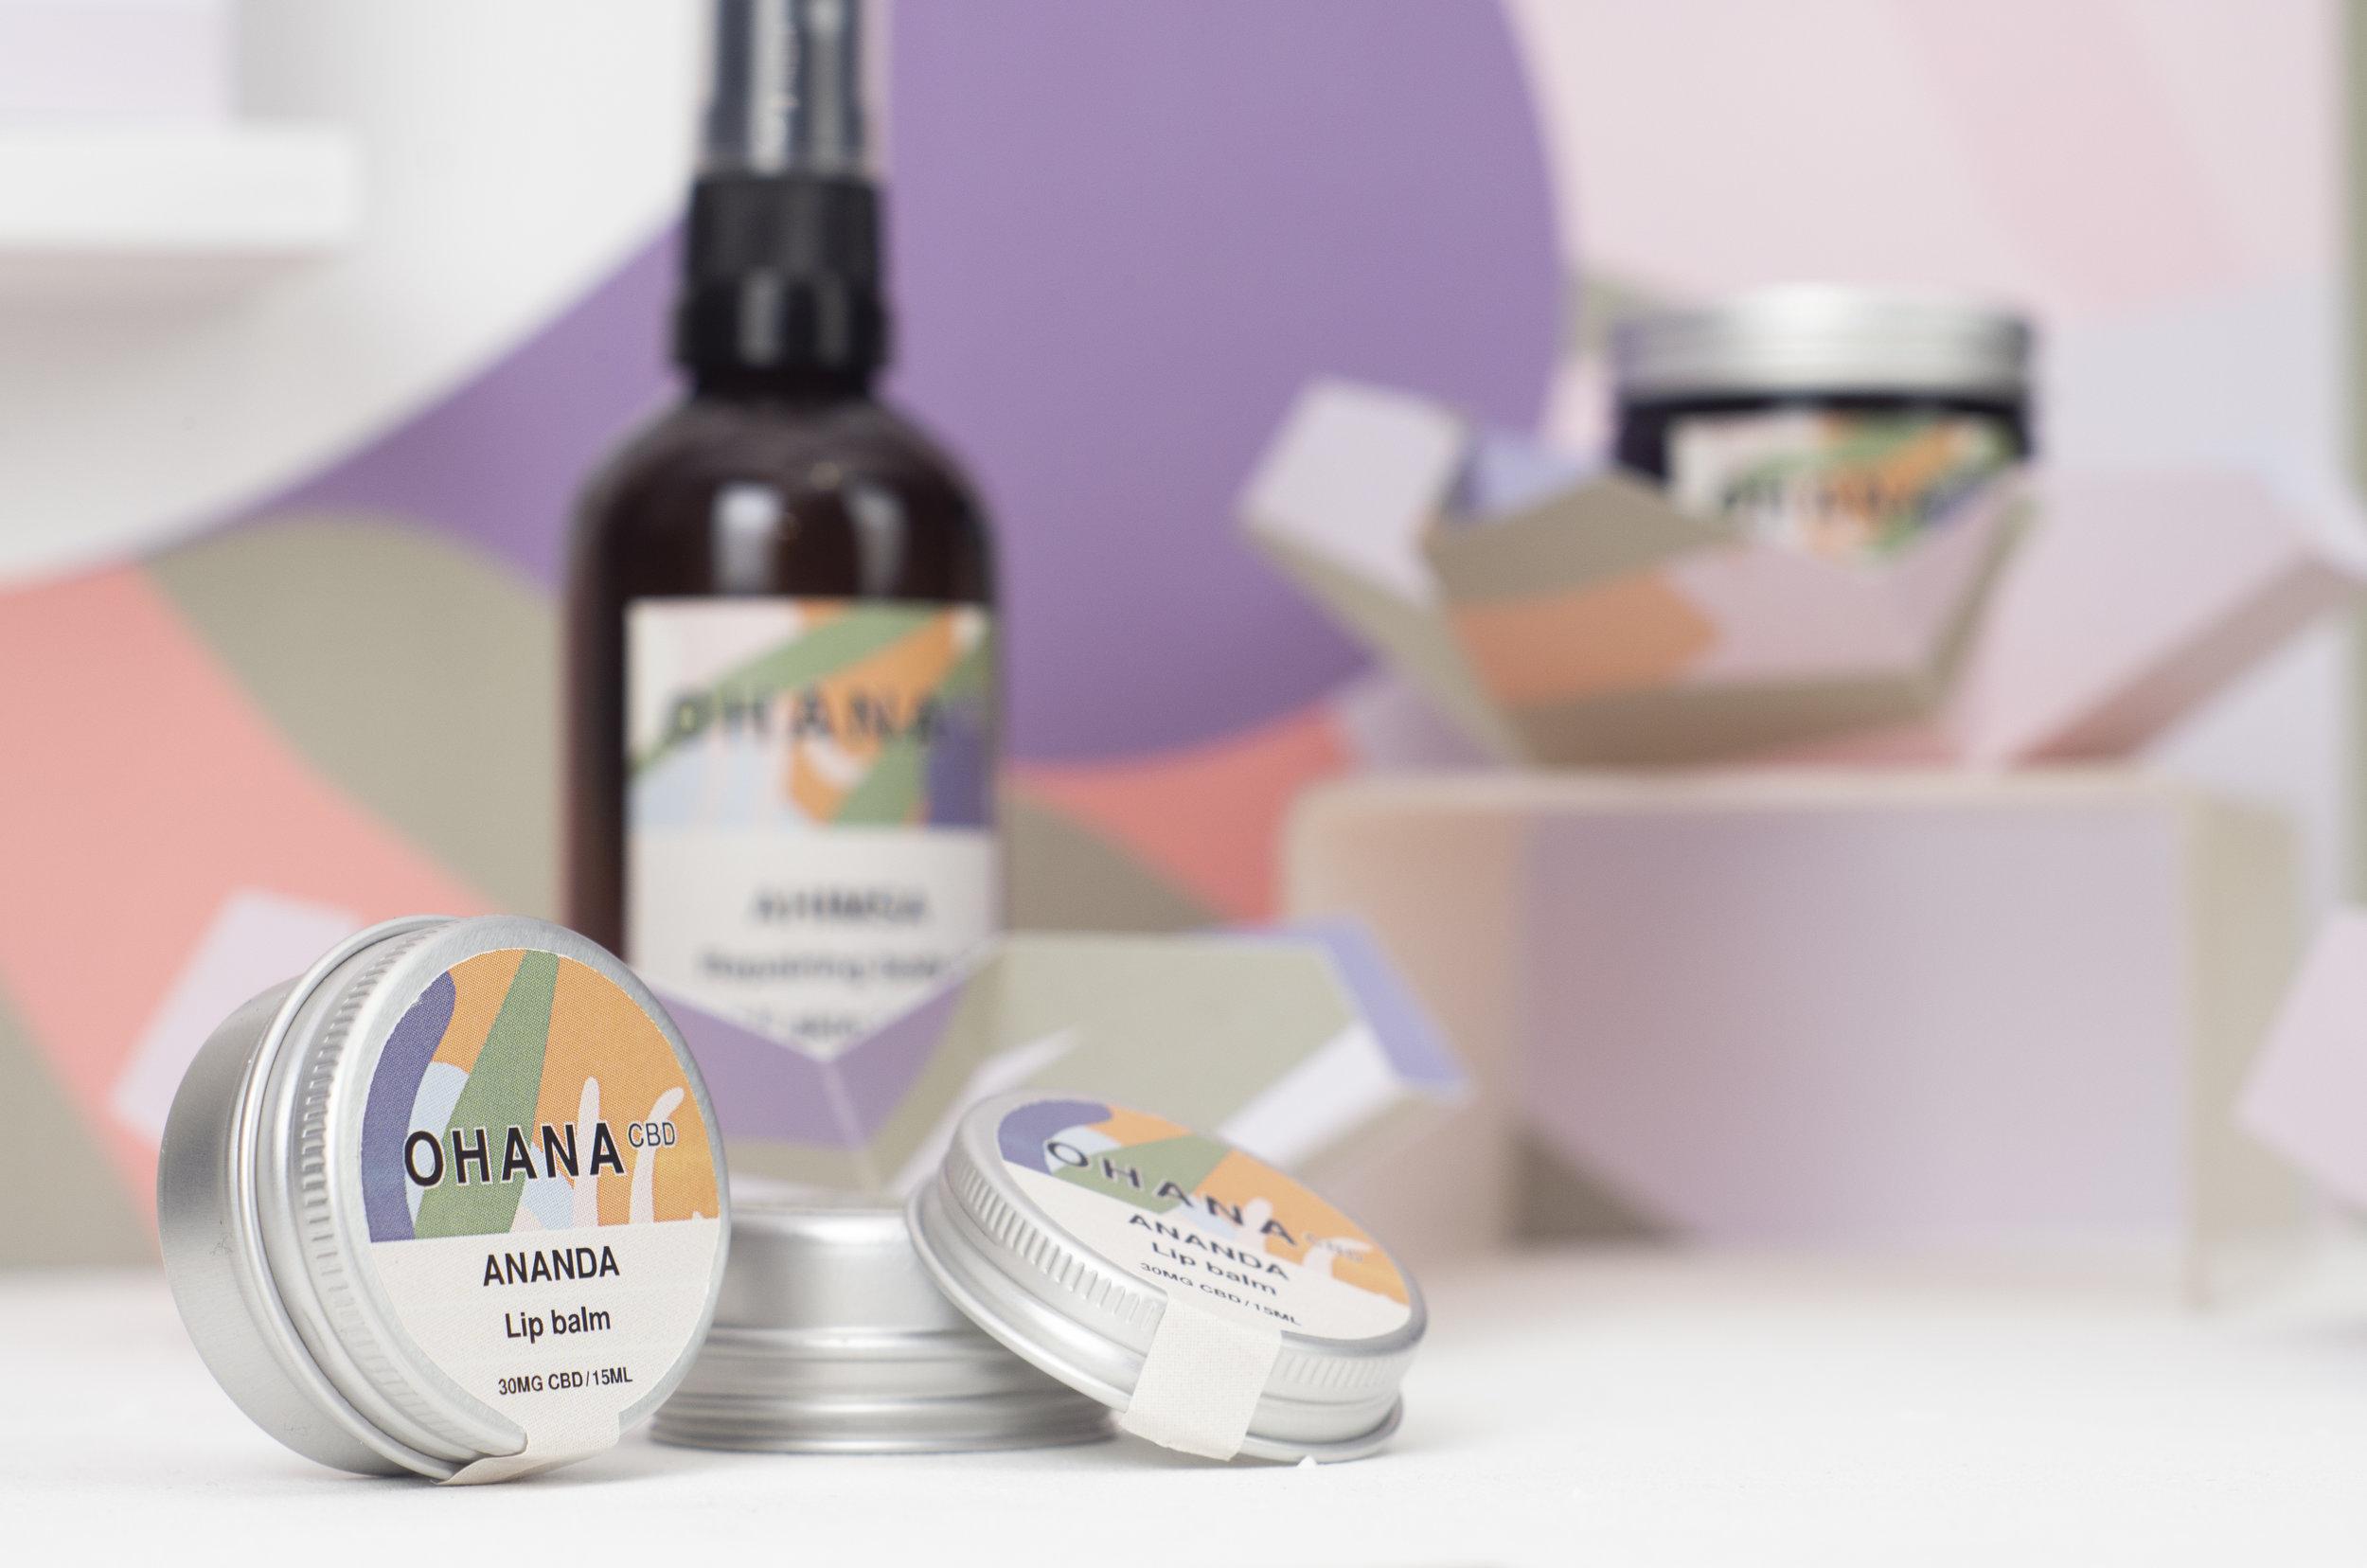 Ohana CBD - Visual Identity for CBD-based skincare brand